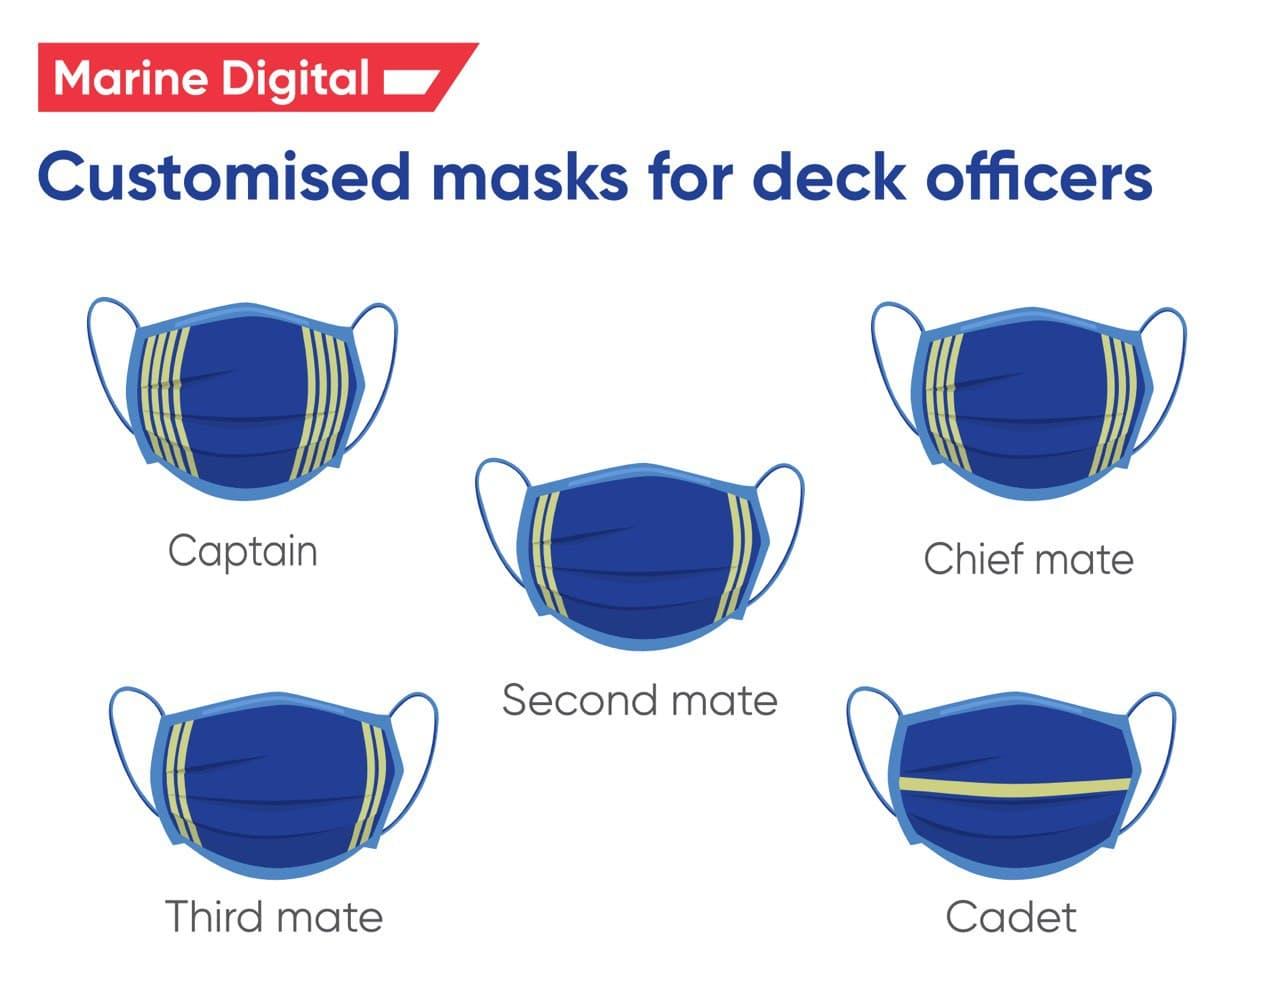 anti-COVID face masks with sailor ranks